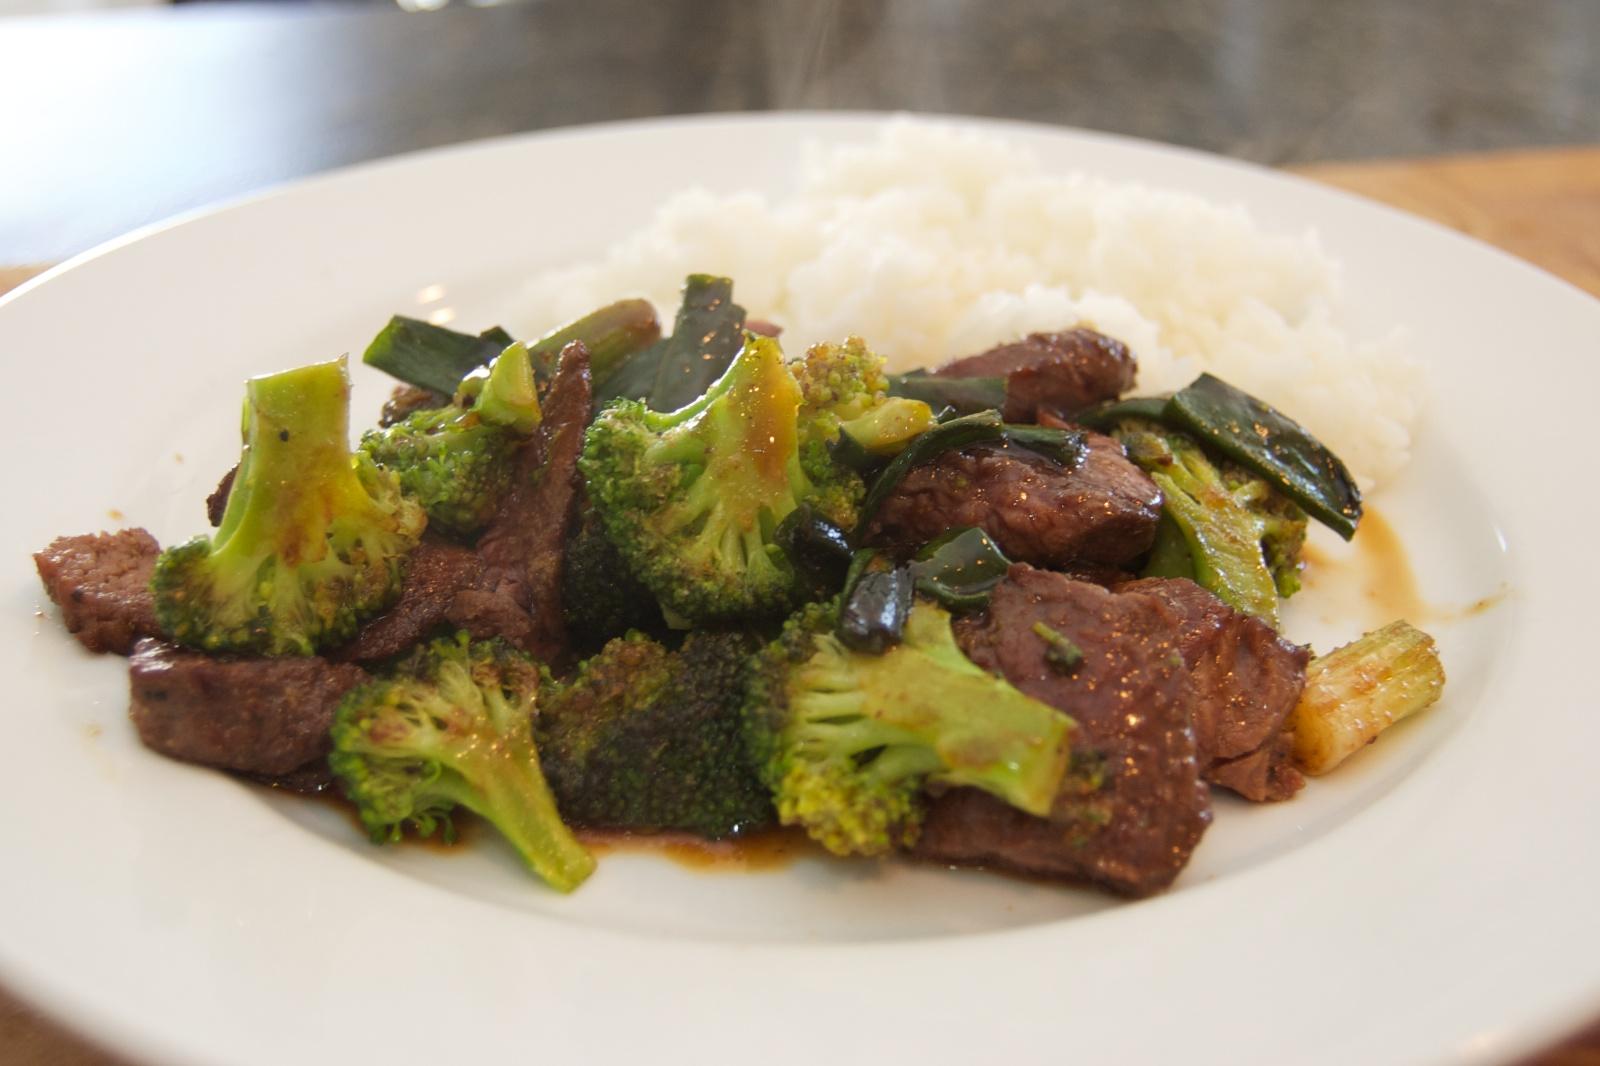 http://blog.rickk.com/food/2011/03/17/ate.2011.03.17.l.jpg